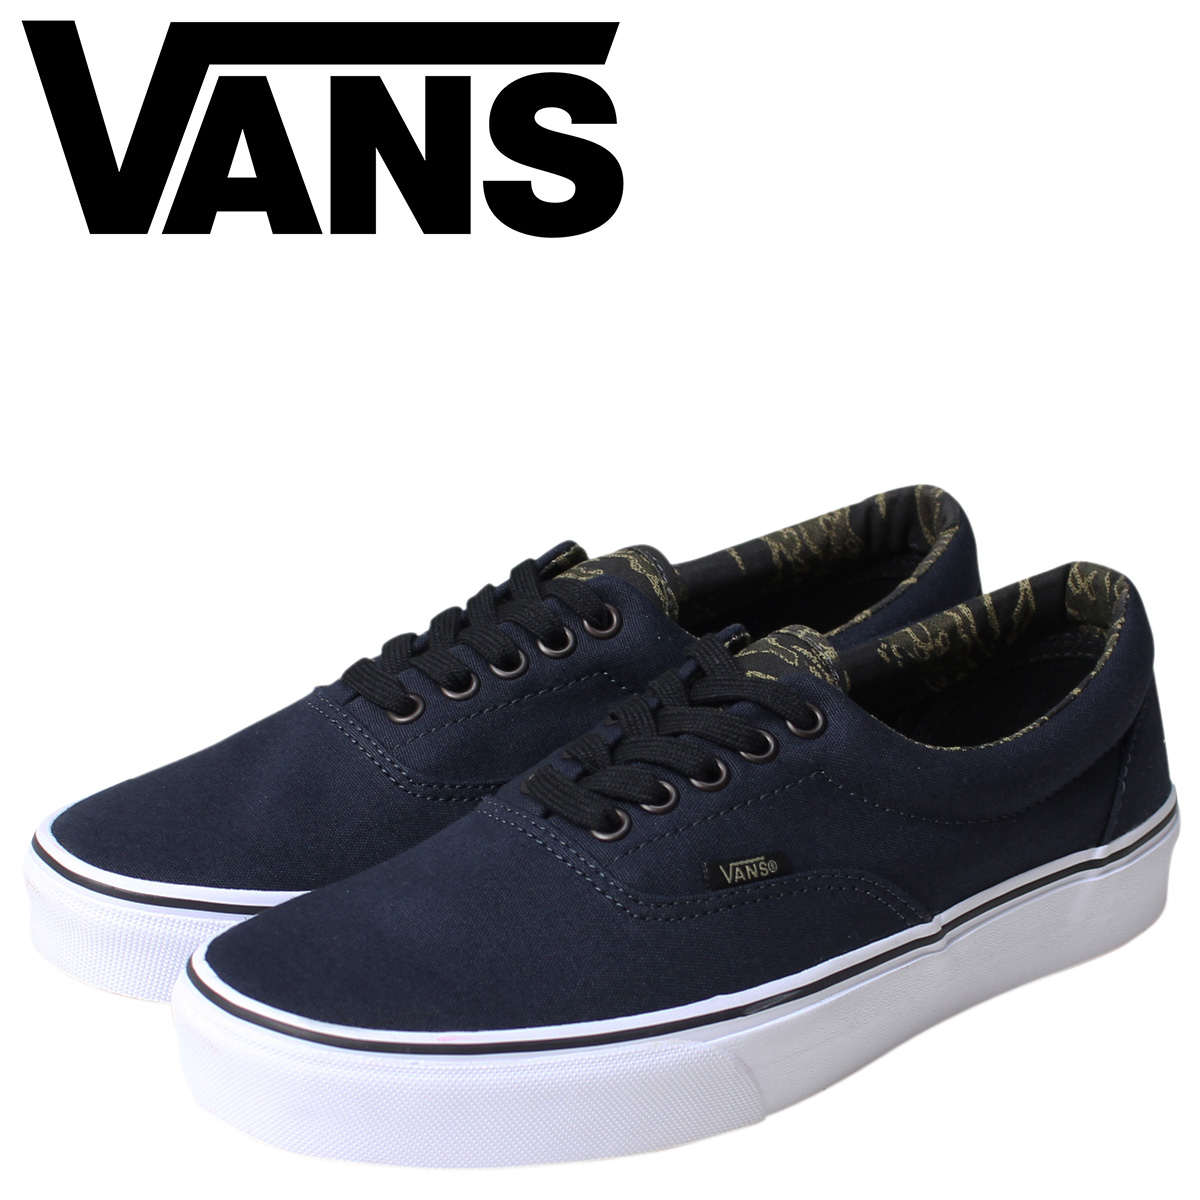 b990738b865 Whats up sports vans slip ons vans gills men sneakers station wagons era  vintage camo a